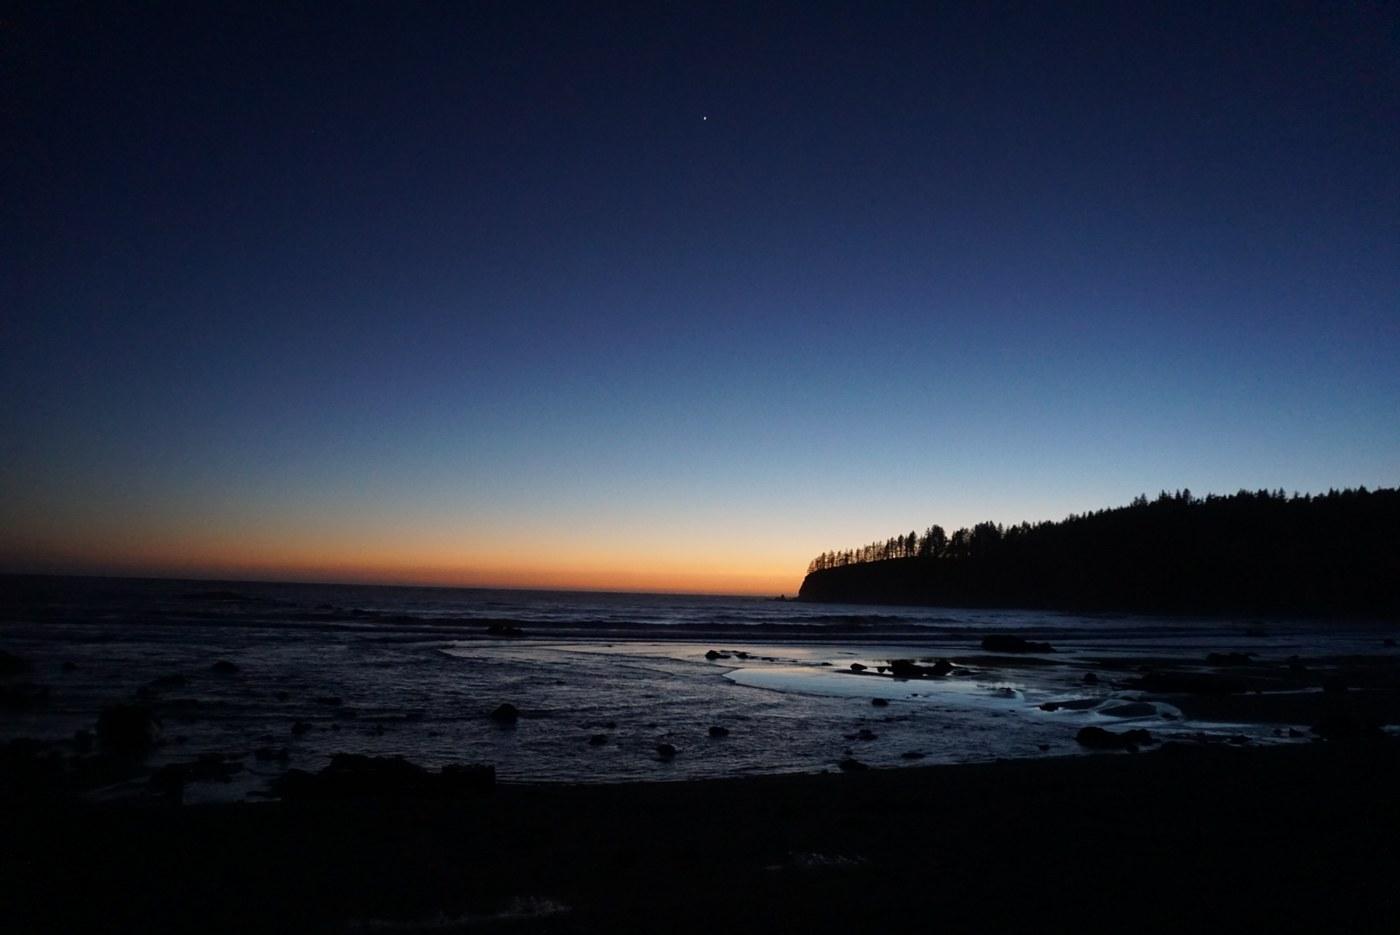 Third Beach at sunset. Photo by jeffdill.